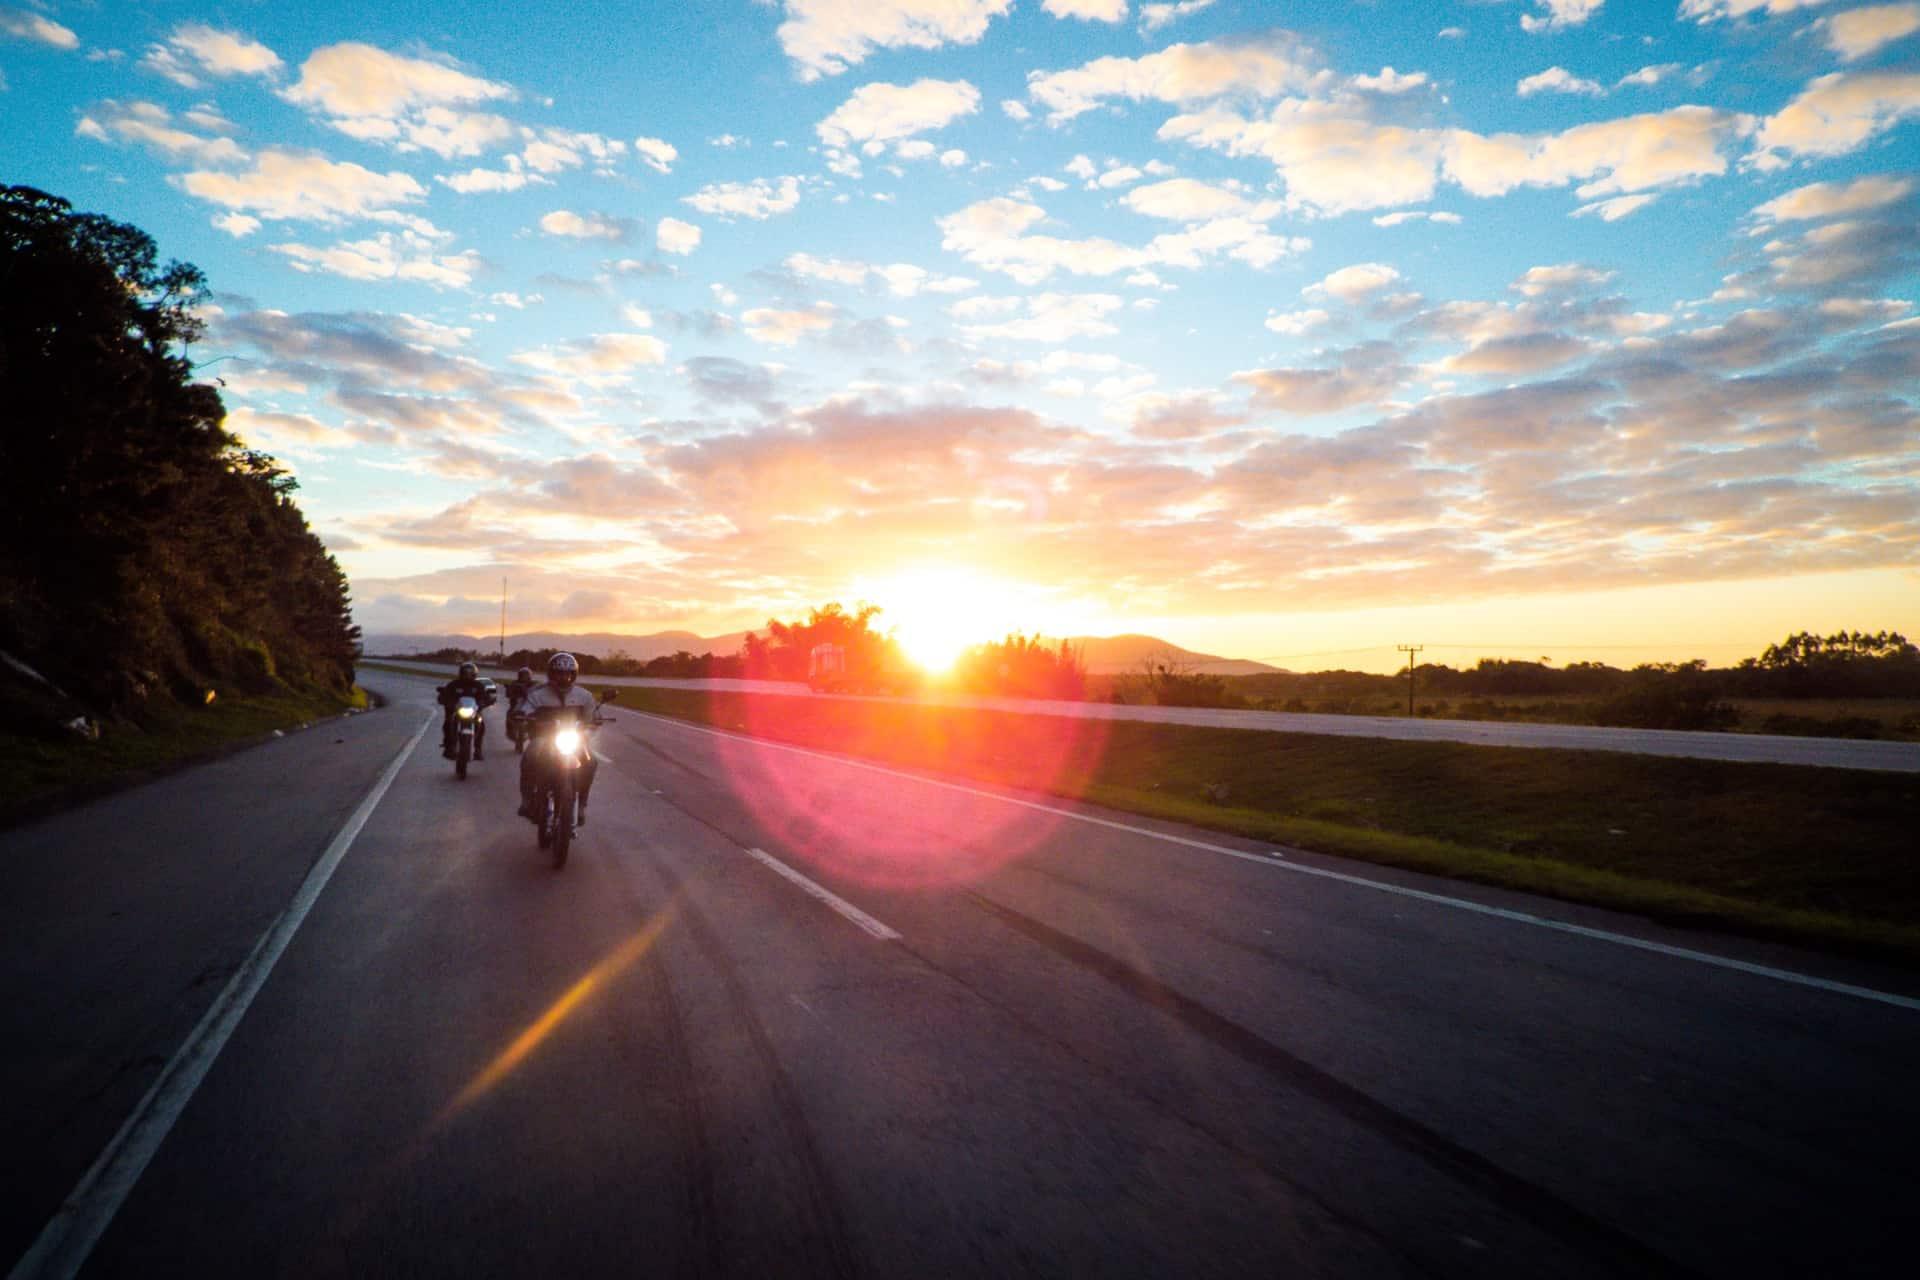 balade moto ©rafael-lopes-de-lima-unsplash